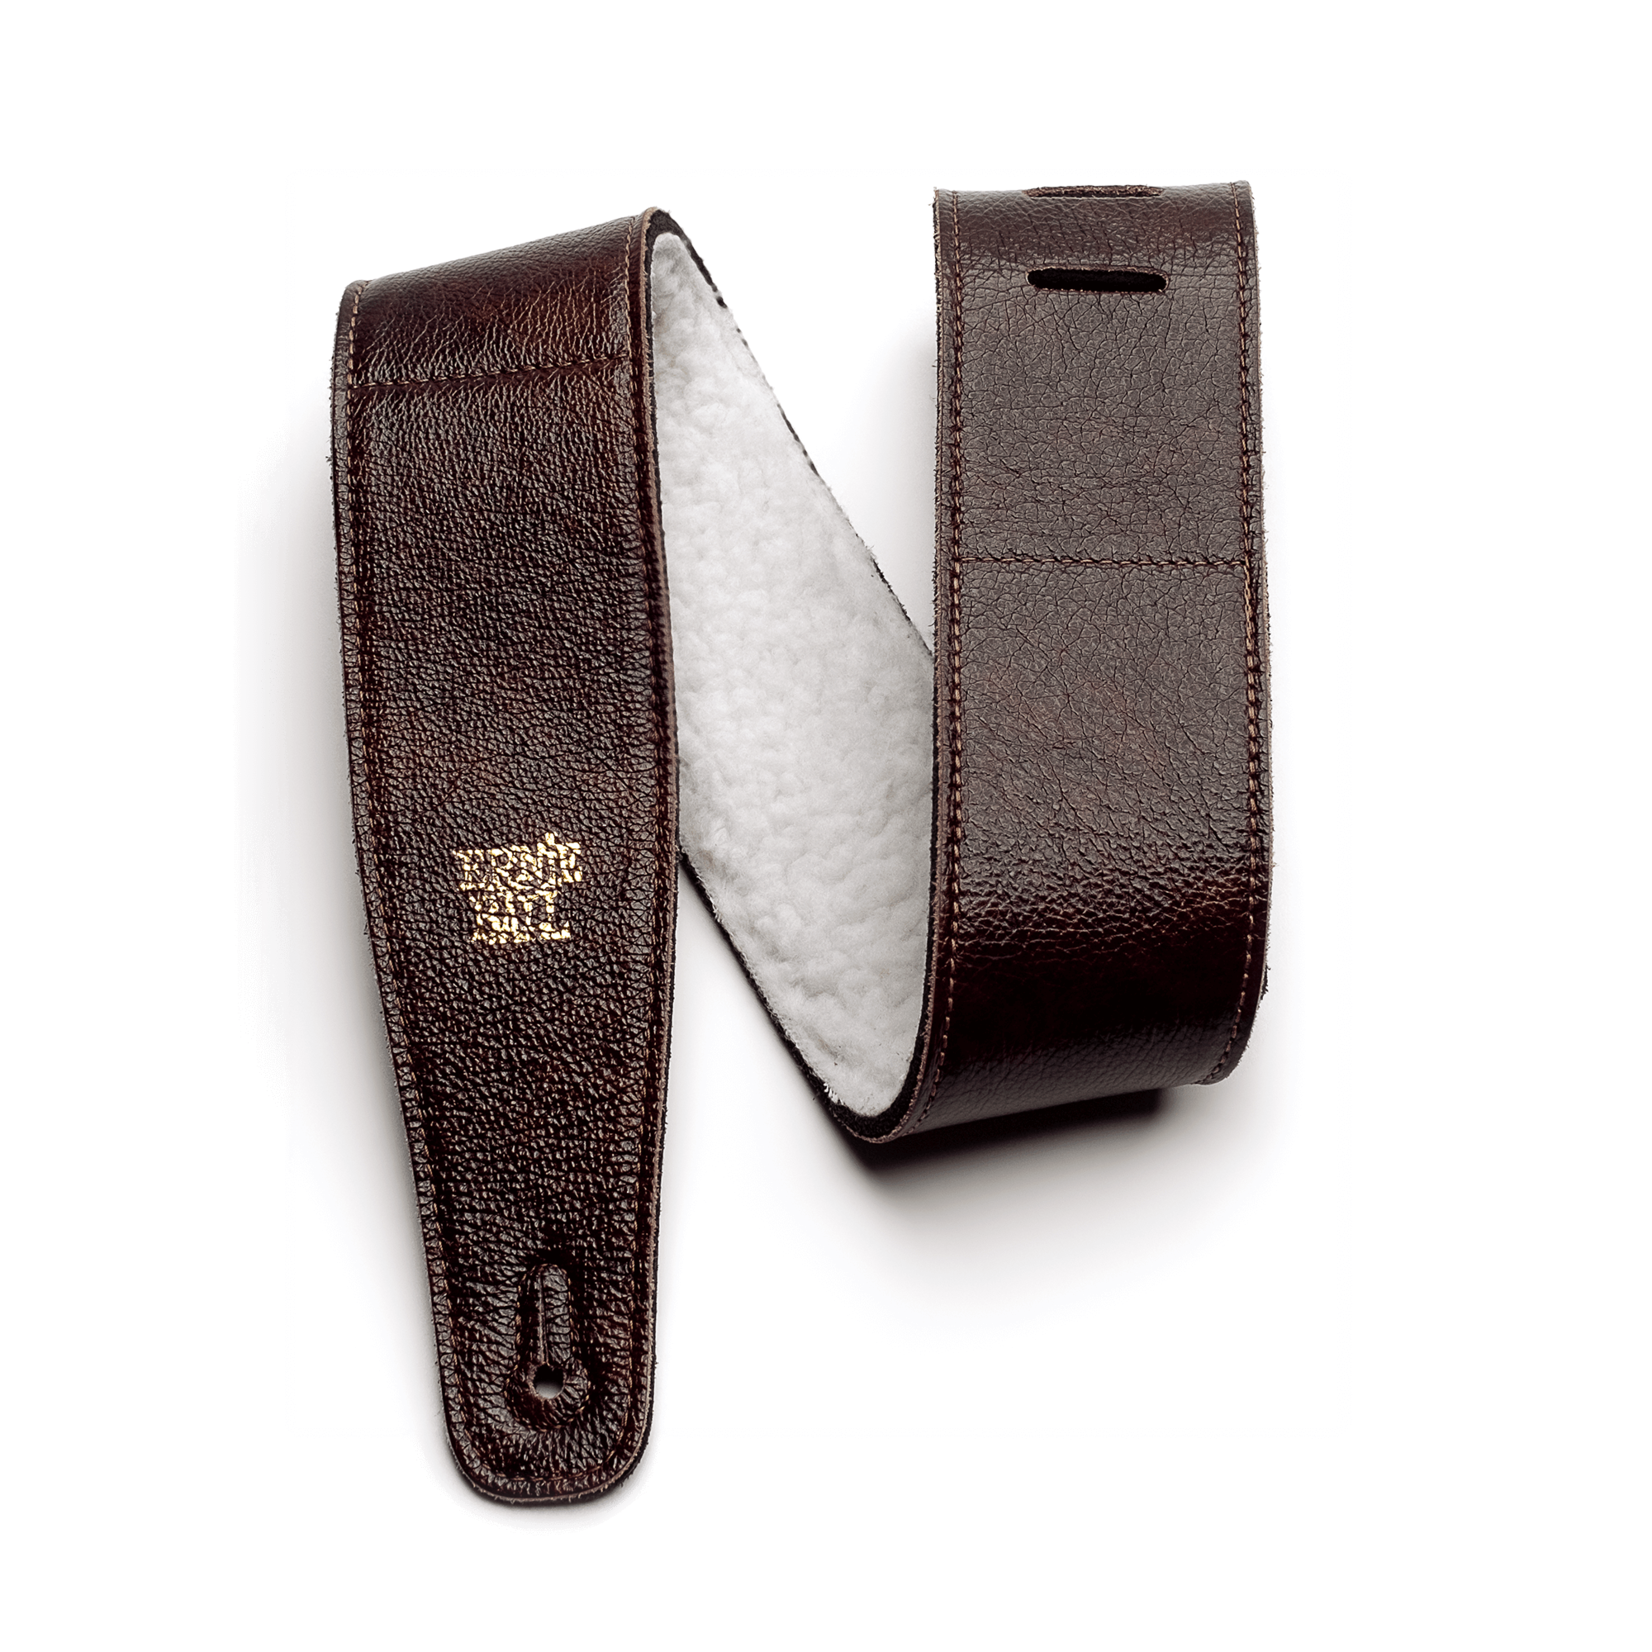 "Ernie Ball Ernie Ball 2.5"" Adjustable Italian Leather Strap with Fur Padding - Chestnut"